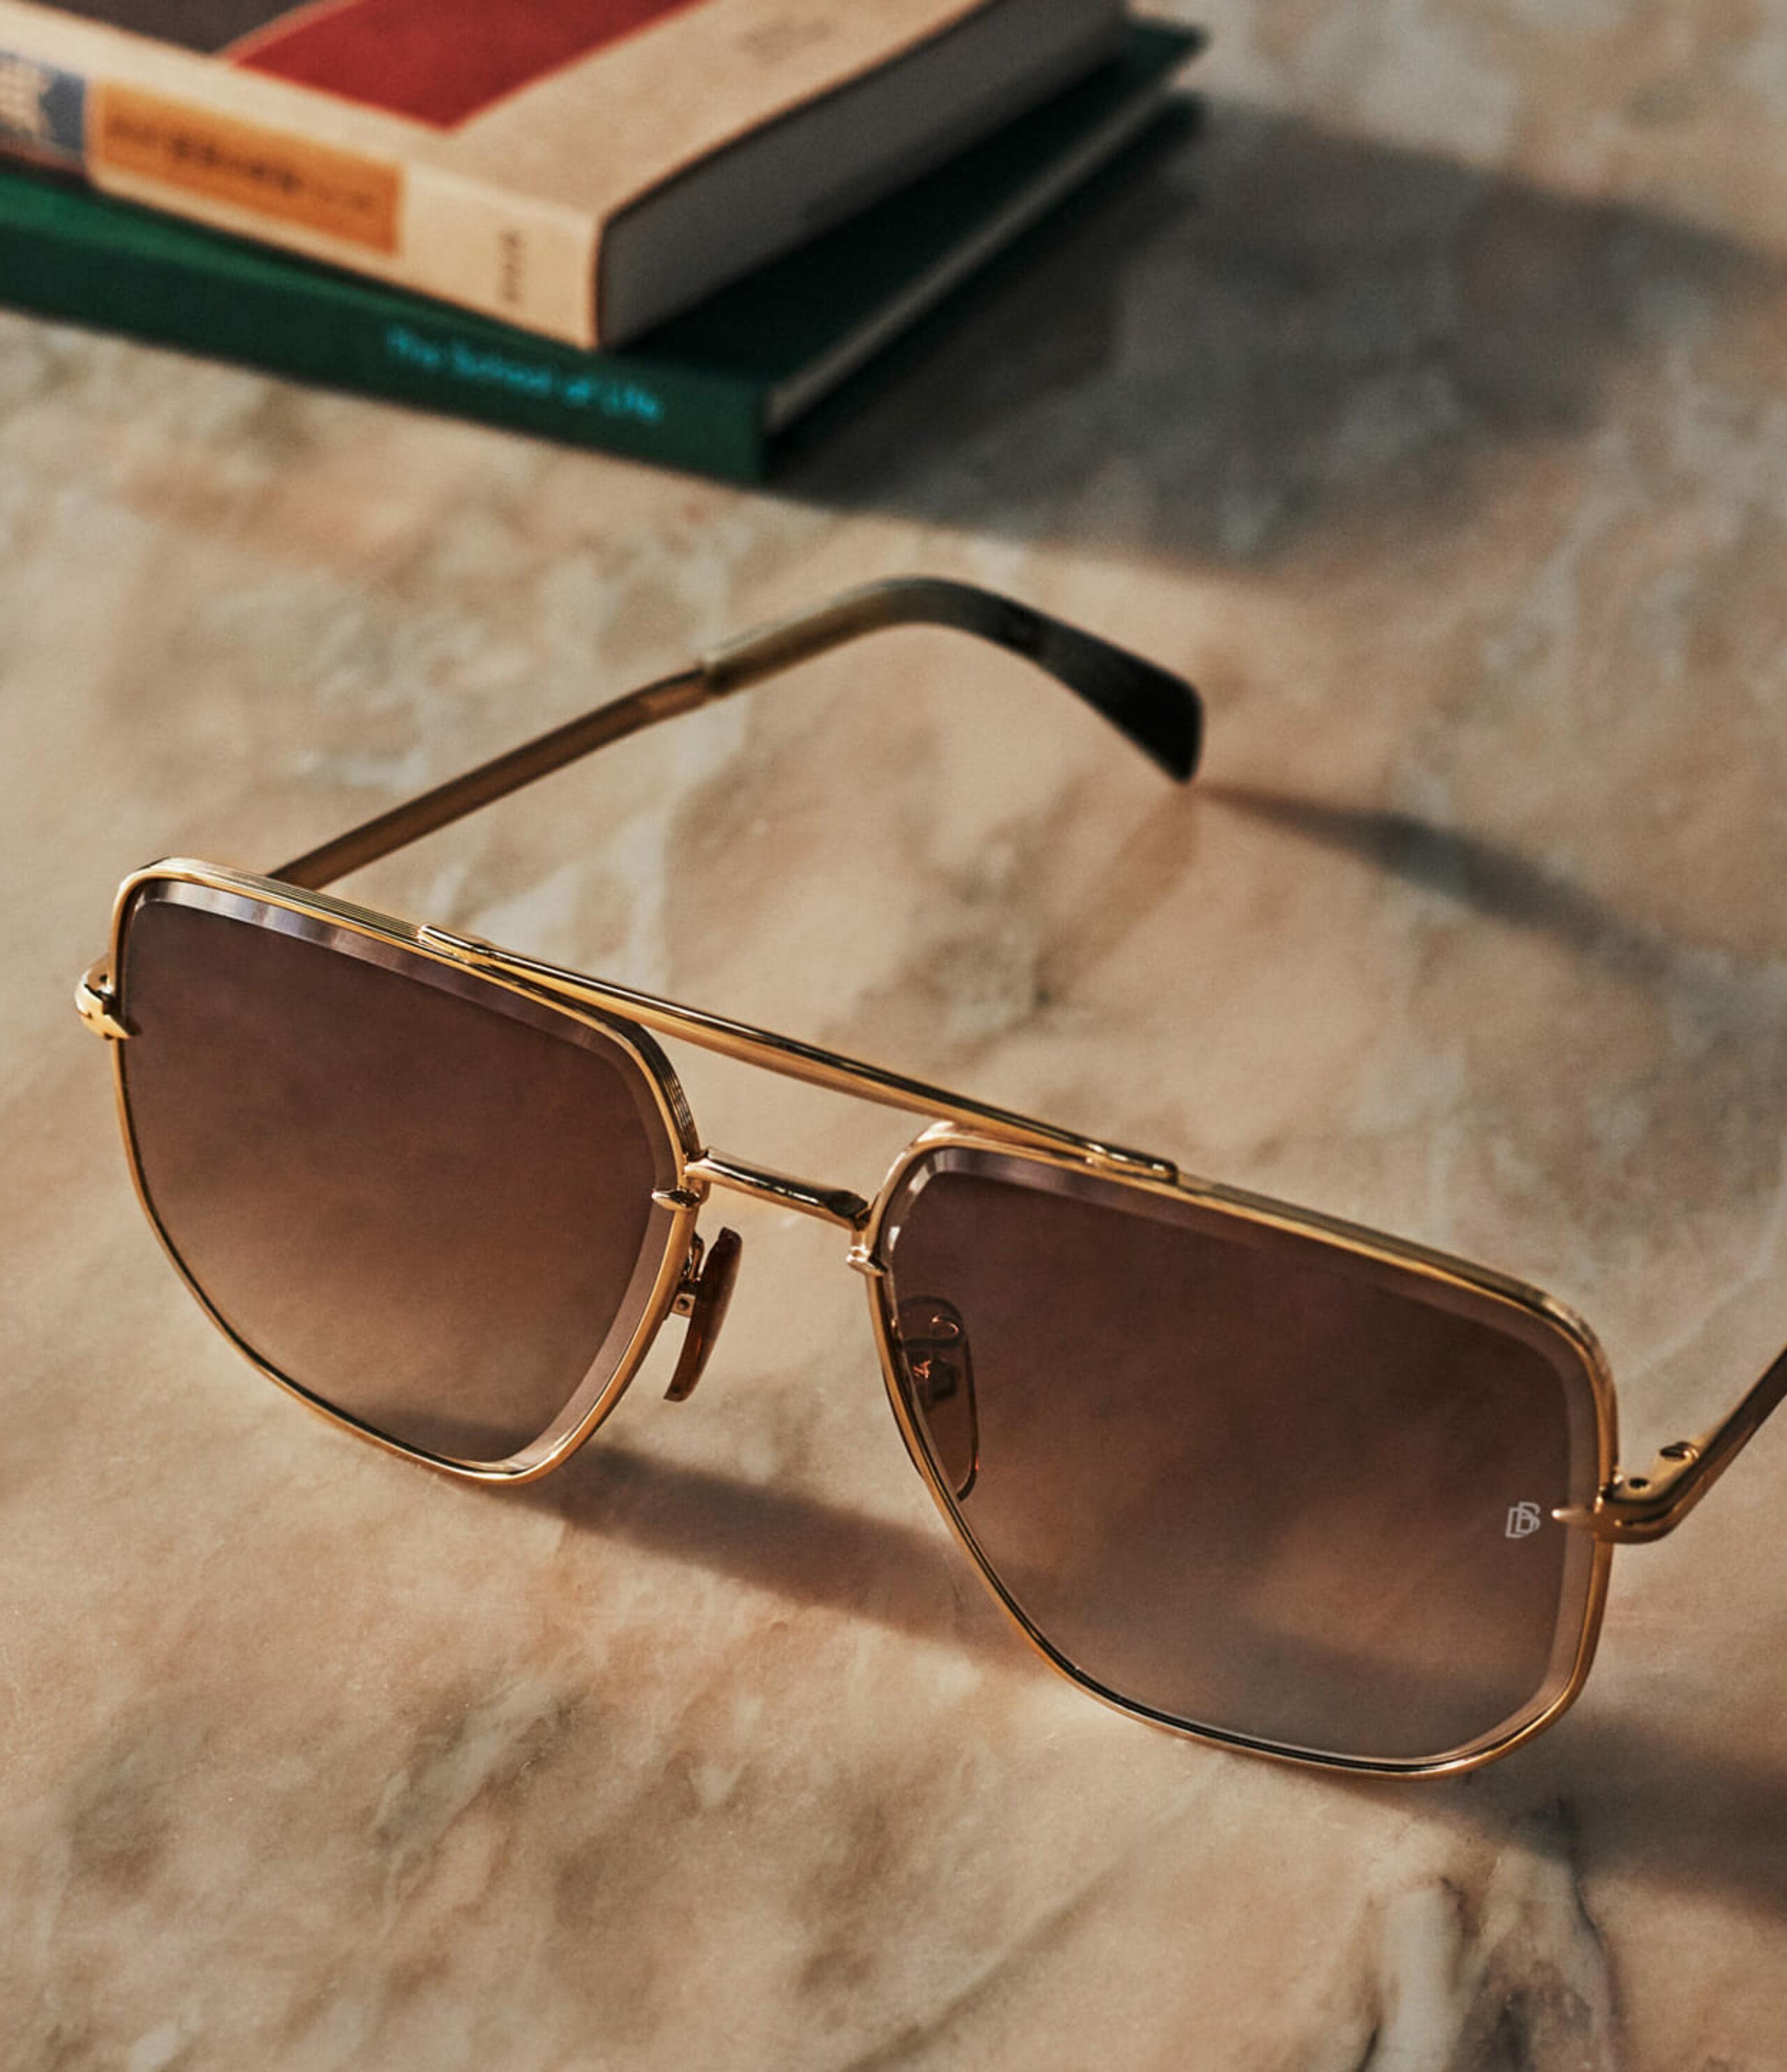 William Morris brillen en zonnebrillen • Frames and Faces Deinze